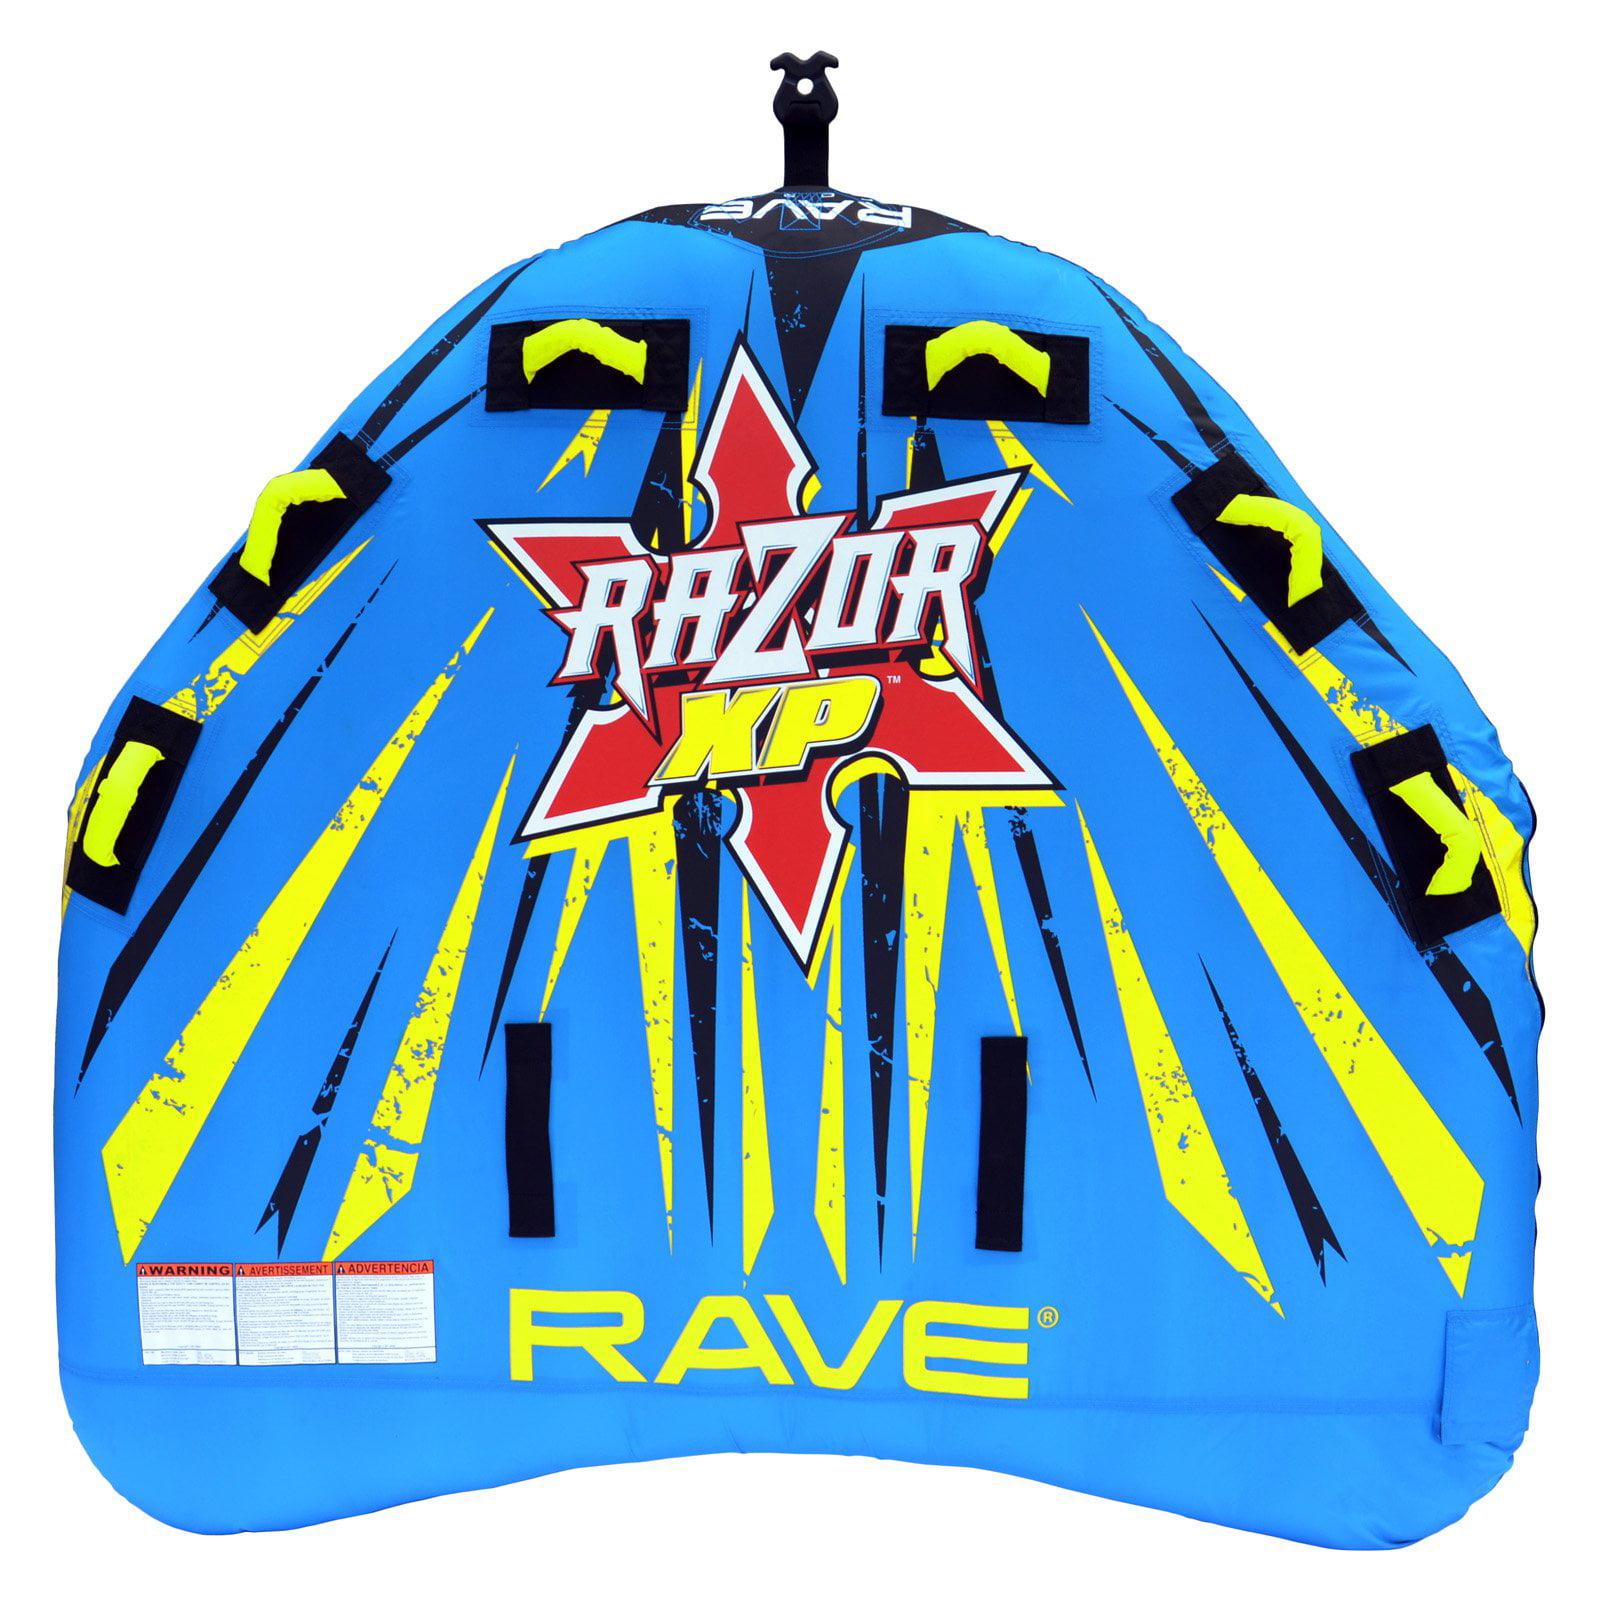 Rave Sports Razor Ski Tube by Rave Sports